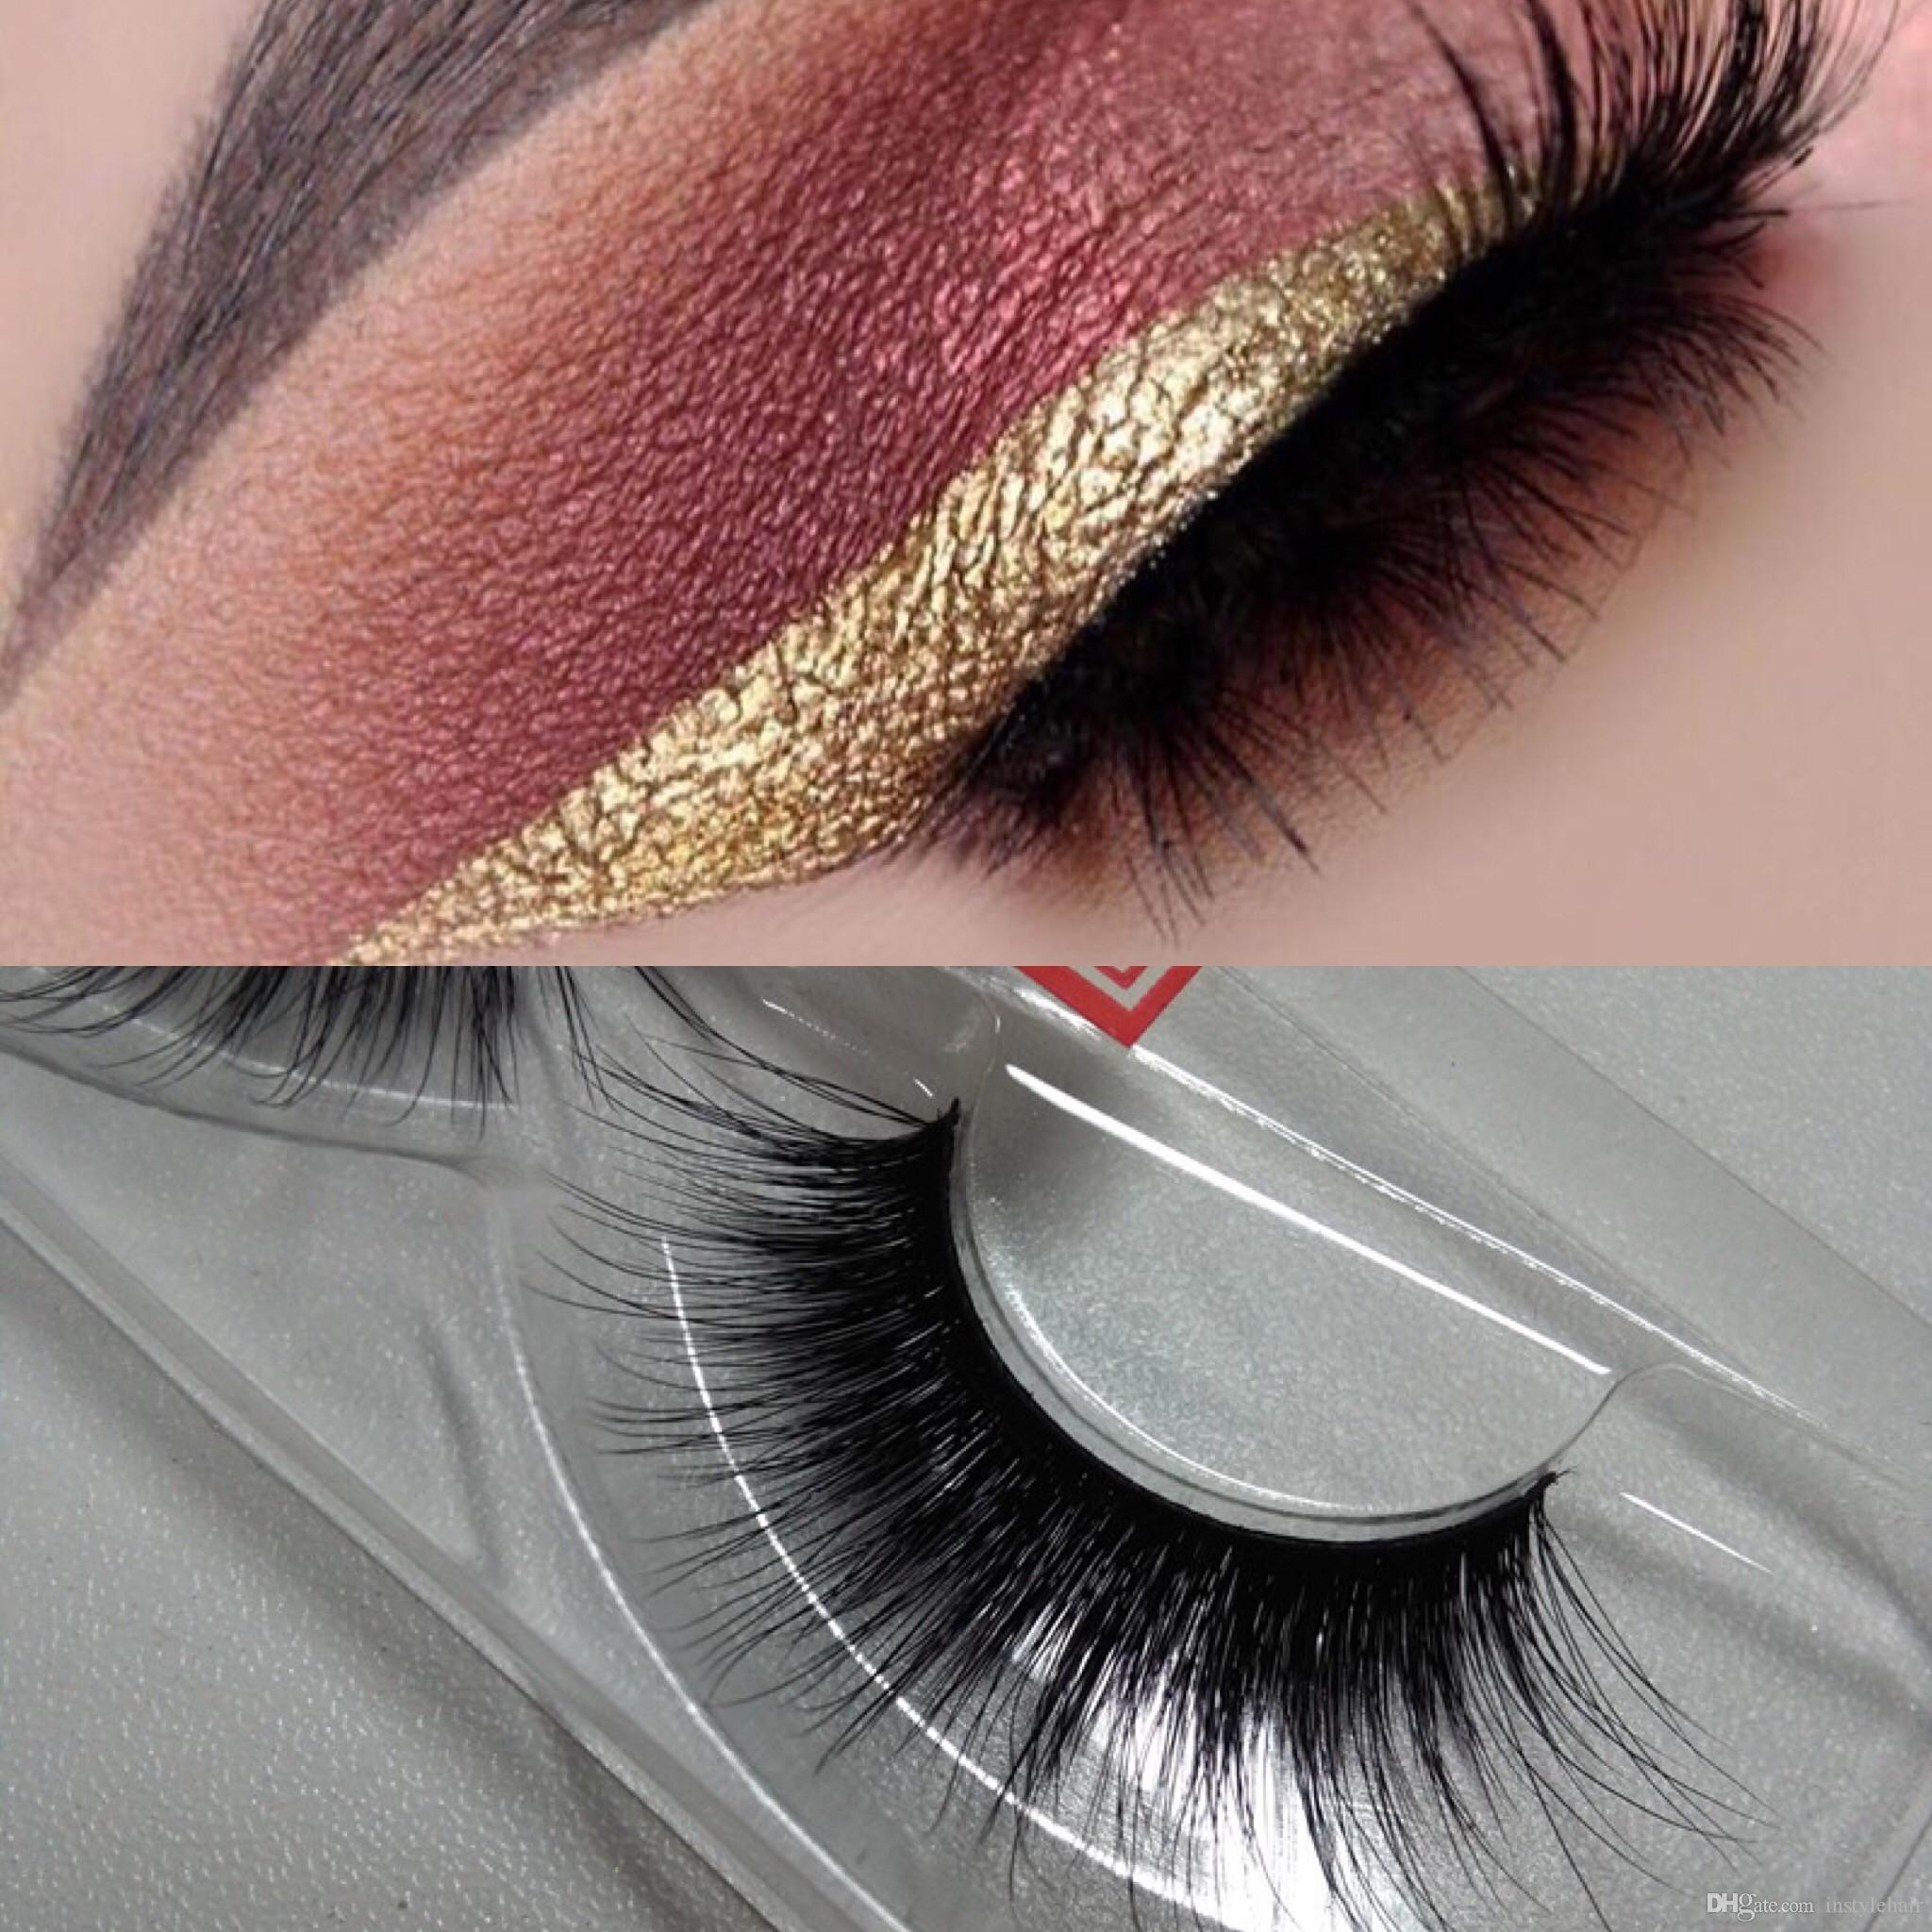 Free shipping in stock 100% Handmade Siberian Strip lashes 3D Eyelashes Hot Sale 15 pairs 3D False Lashes